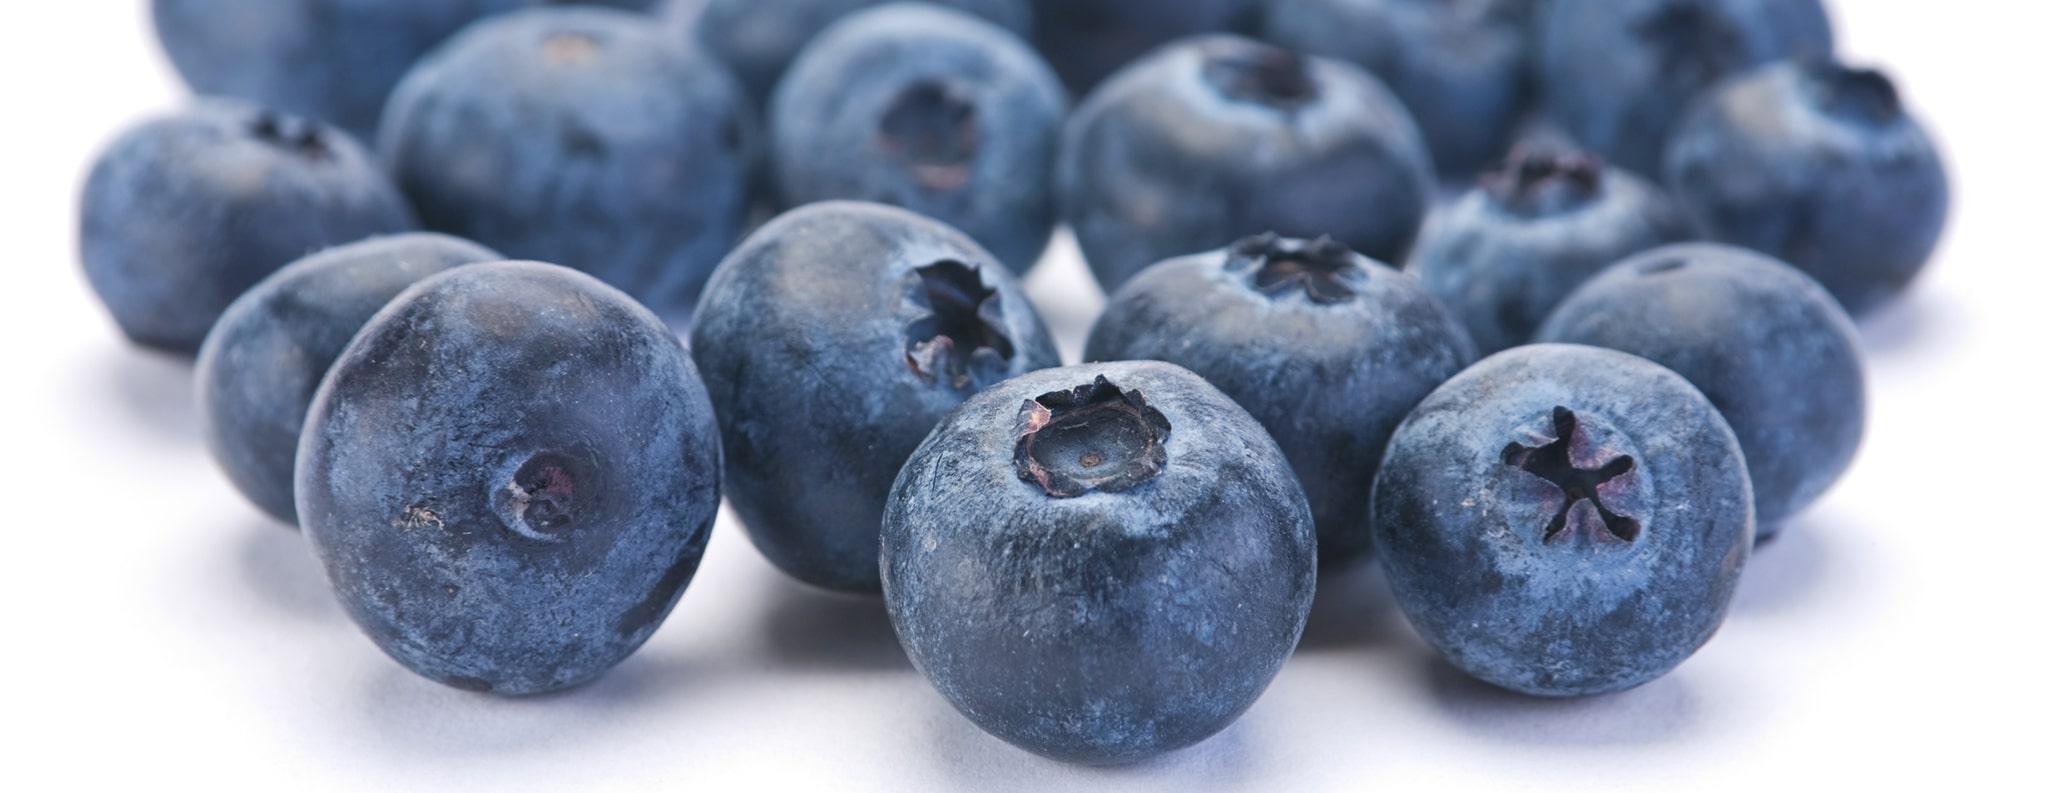 blueberries-1